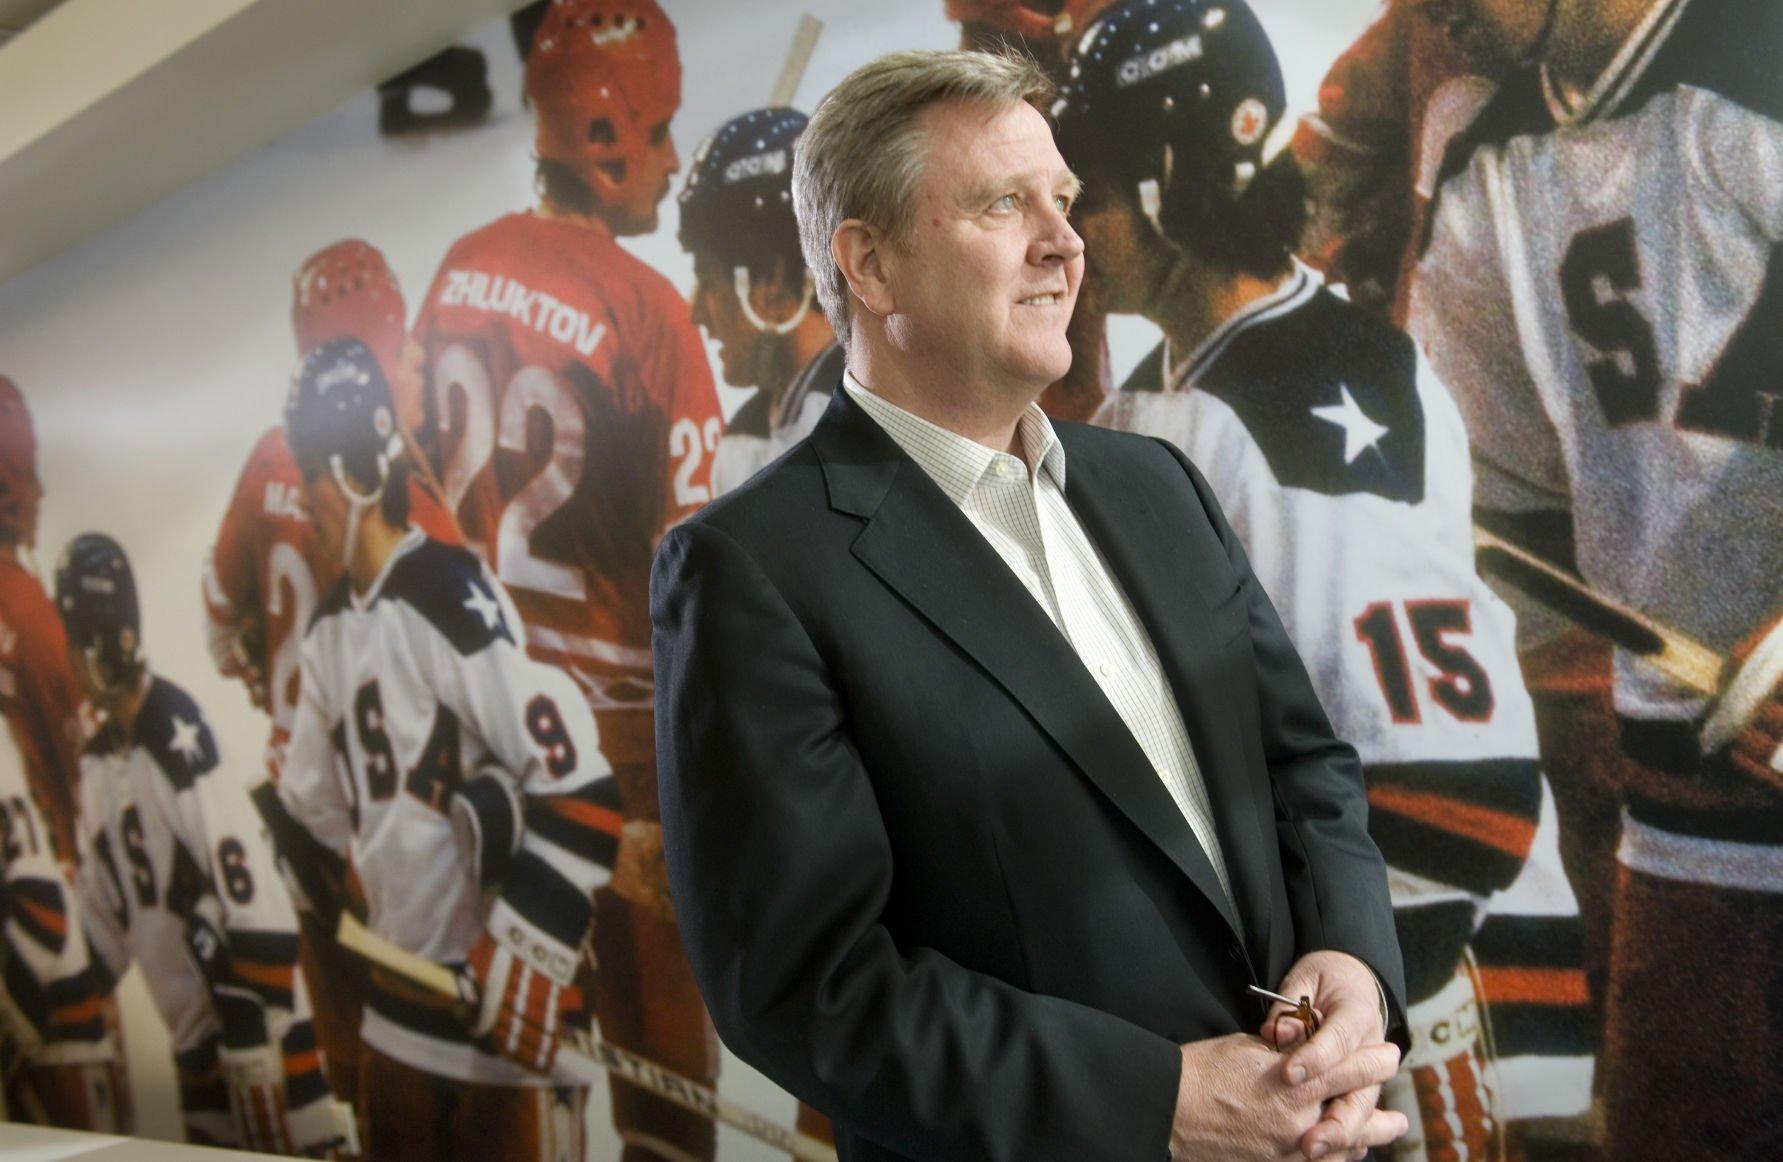 U.S. senators suggest former Olympic officials should face legal ramifications